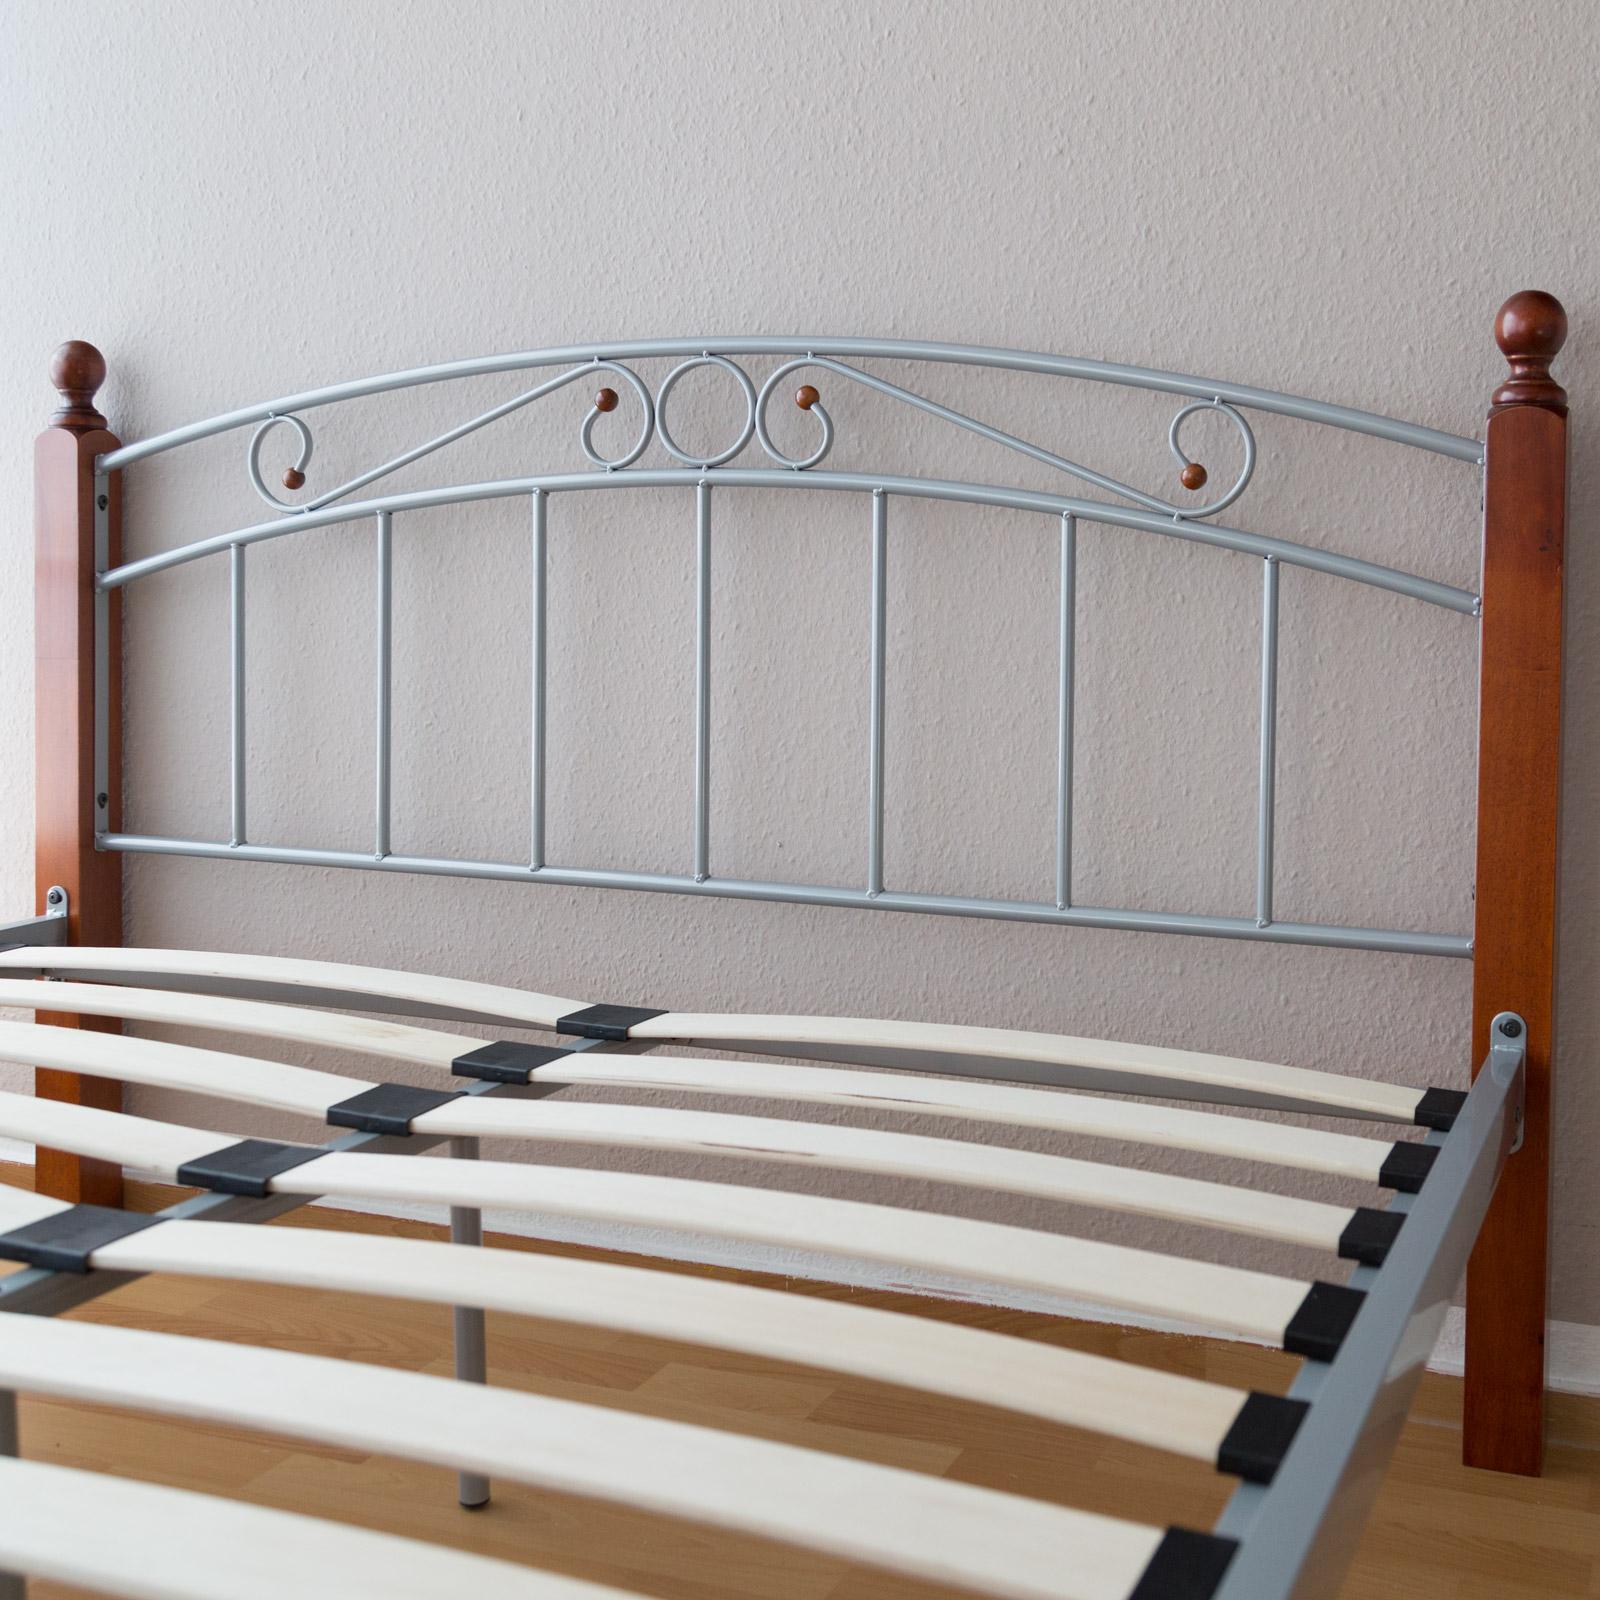 Metallbett 180 x 200 Bettgestell Doppelbett Bettrahmen + Lattenrost ...